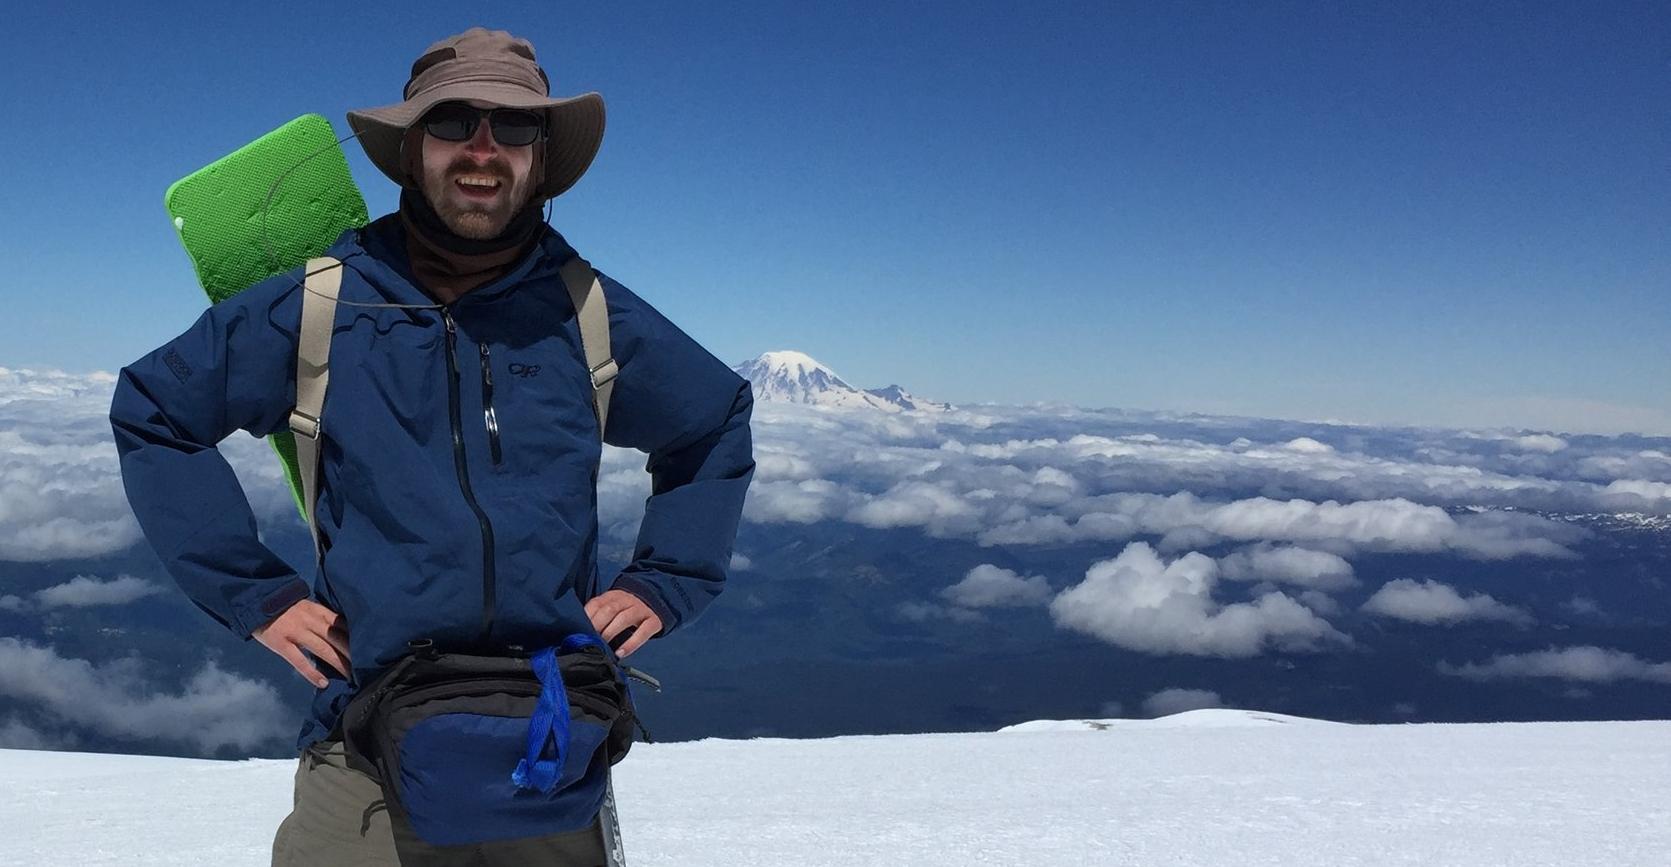 Summit of Mt. Adams, Washington, 2016